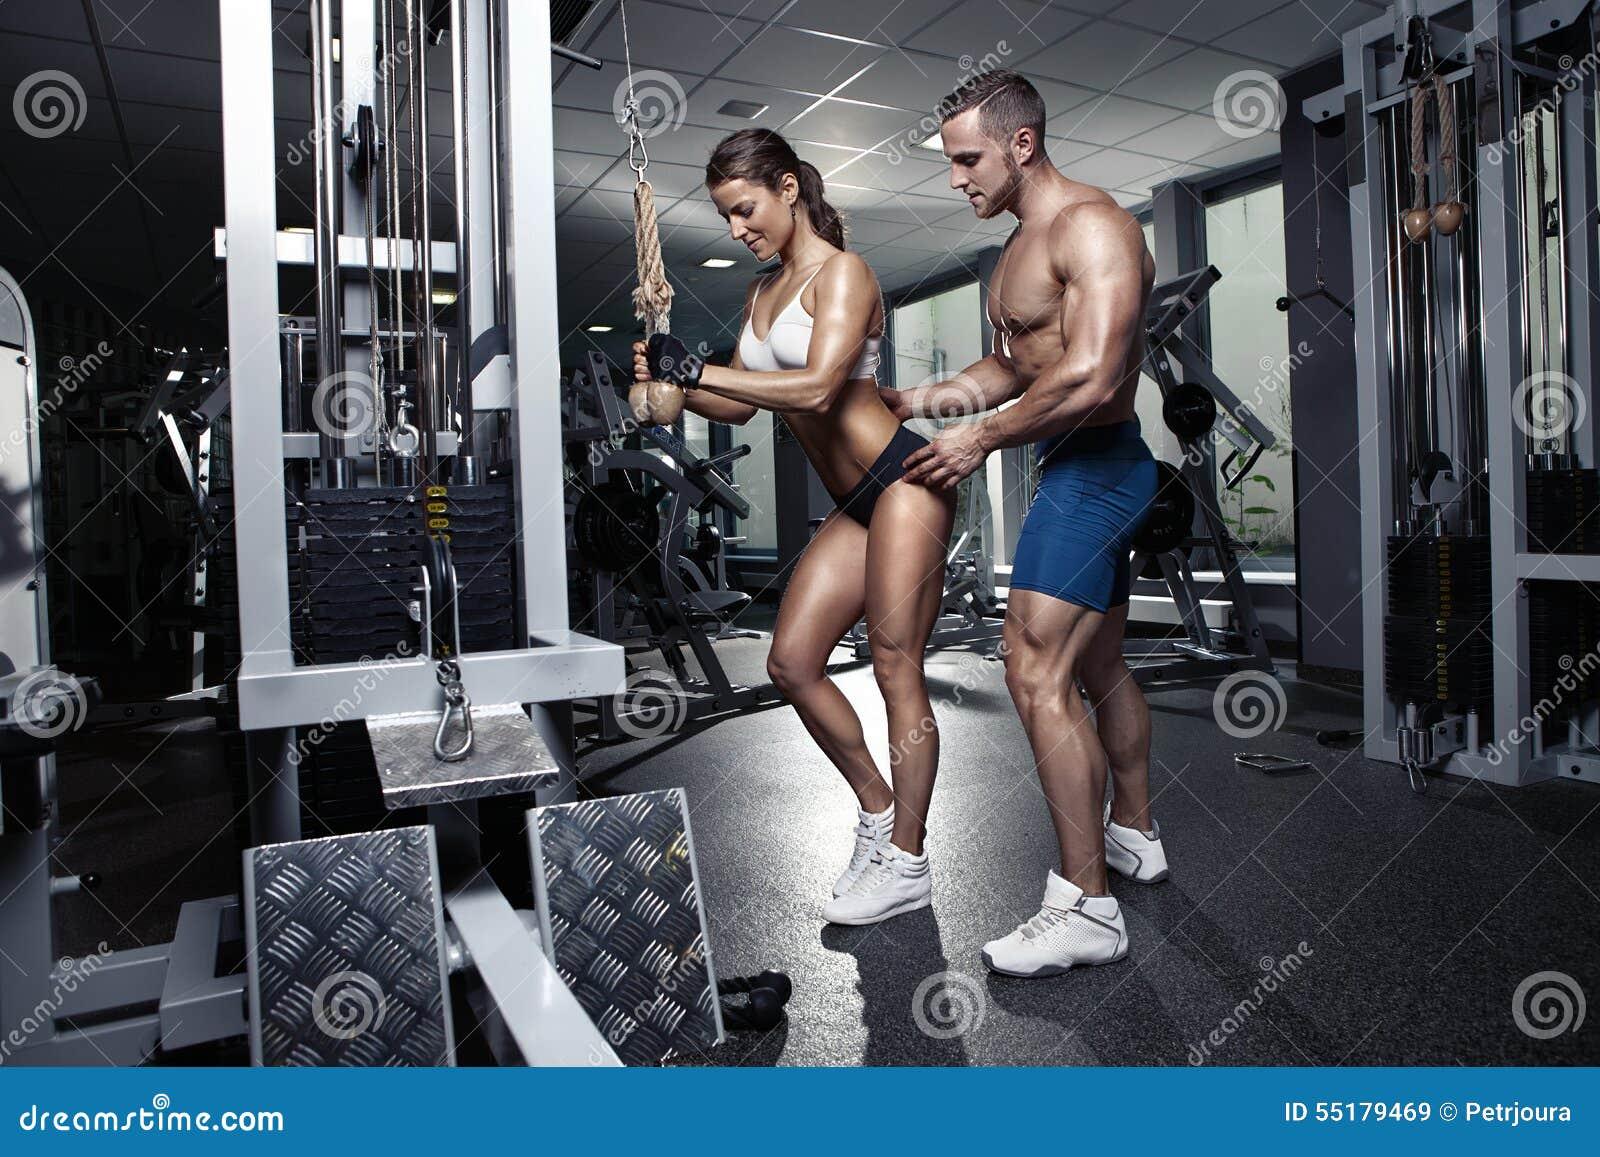 Секса в спортзал 4 фотография